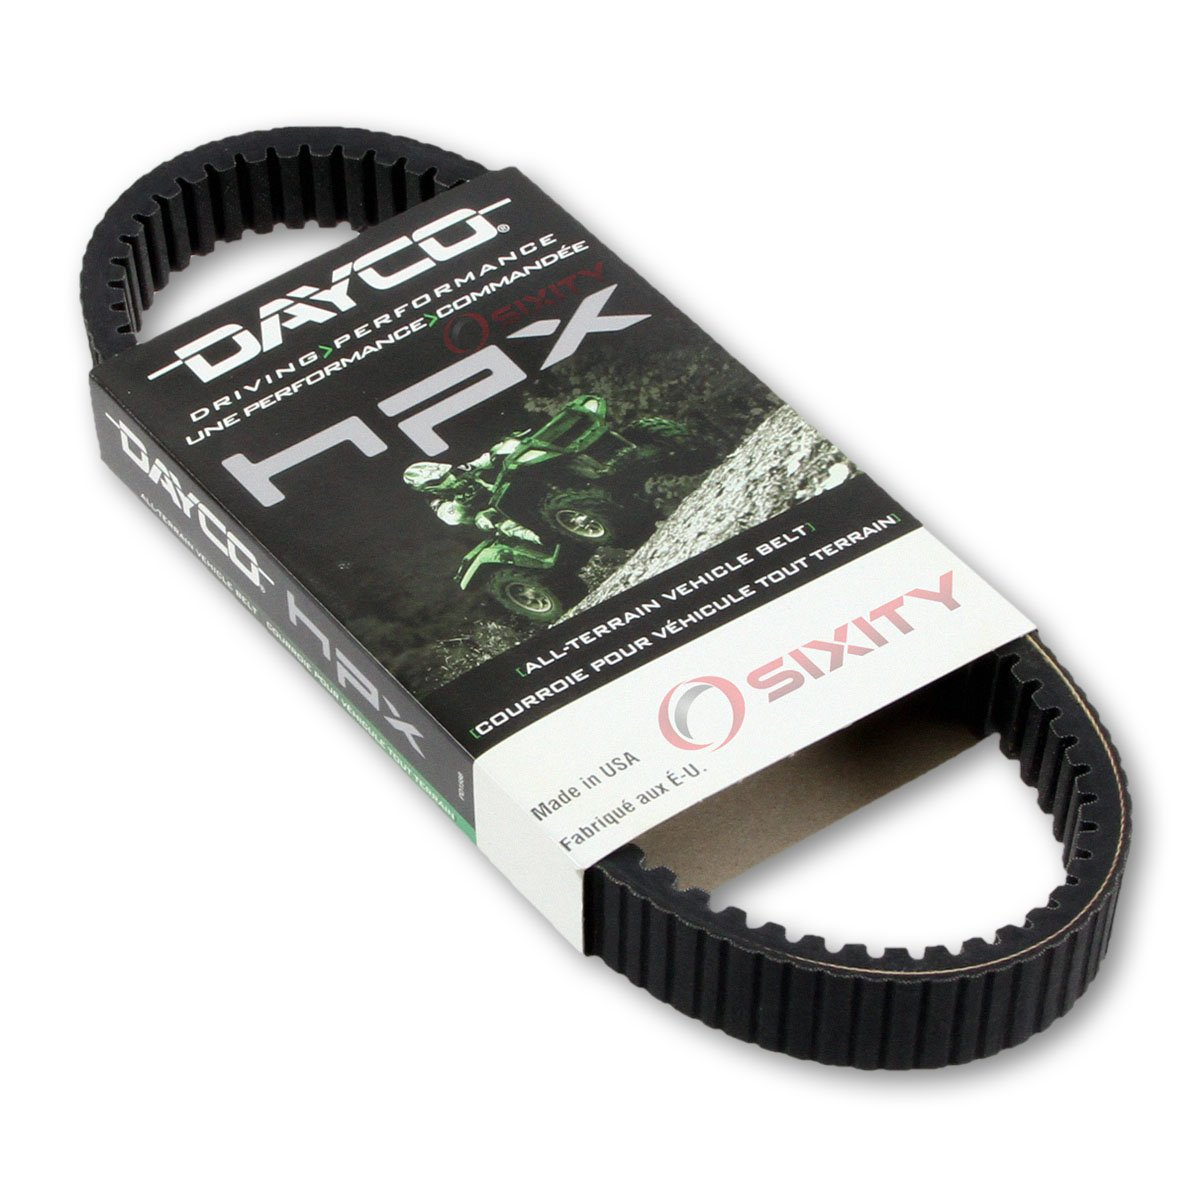 1995-1997 Polaris Magnum 425 4x4 Drive Belt Dayco HPX ATV OEM Upgrade Replacement Transmission Belts